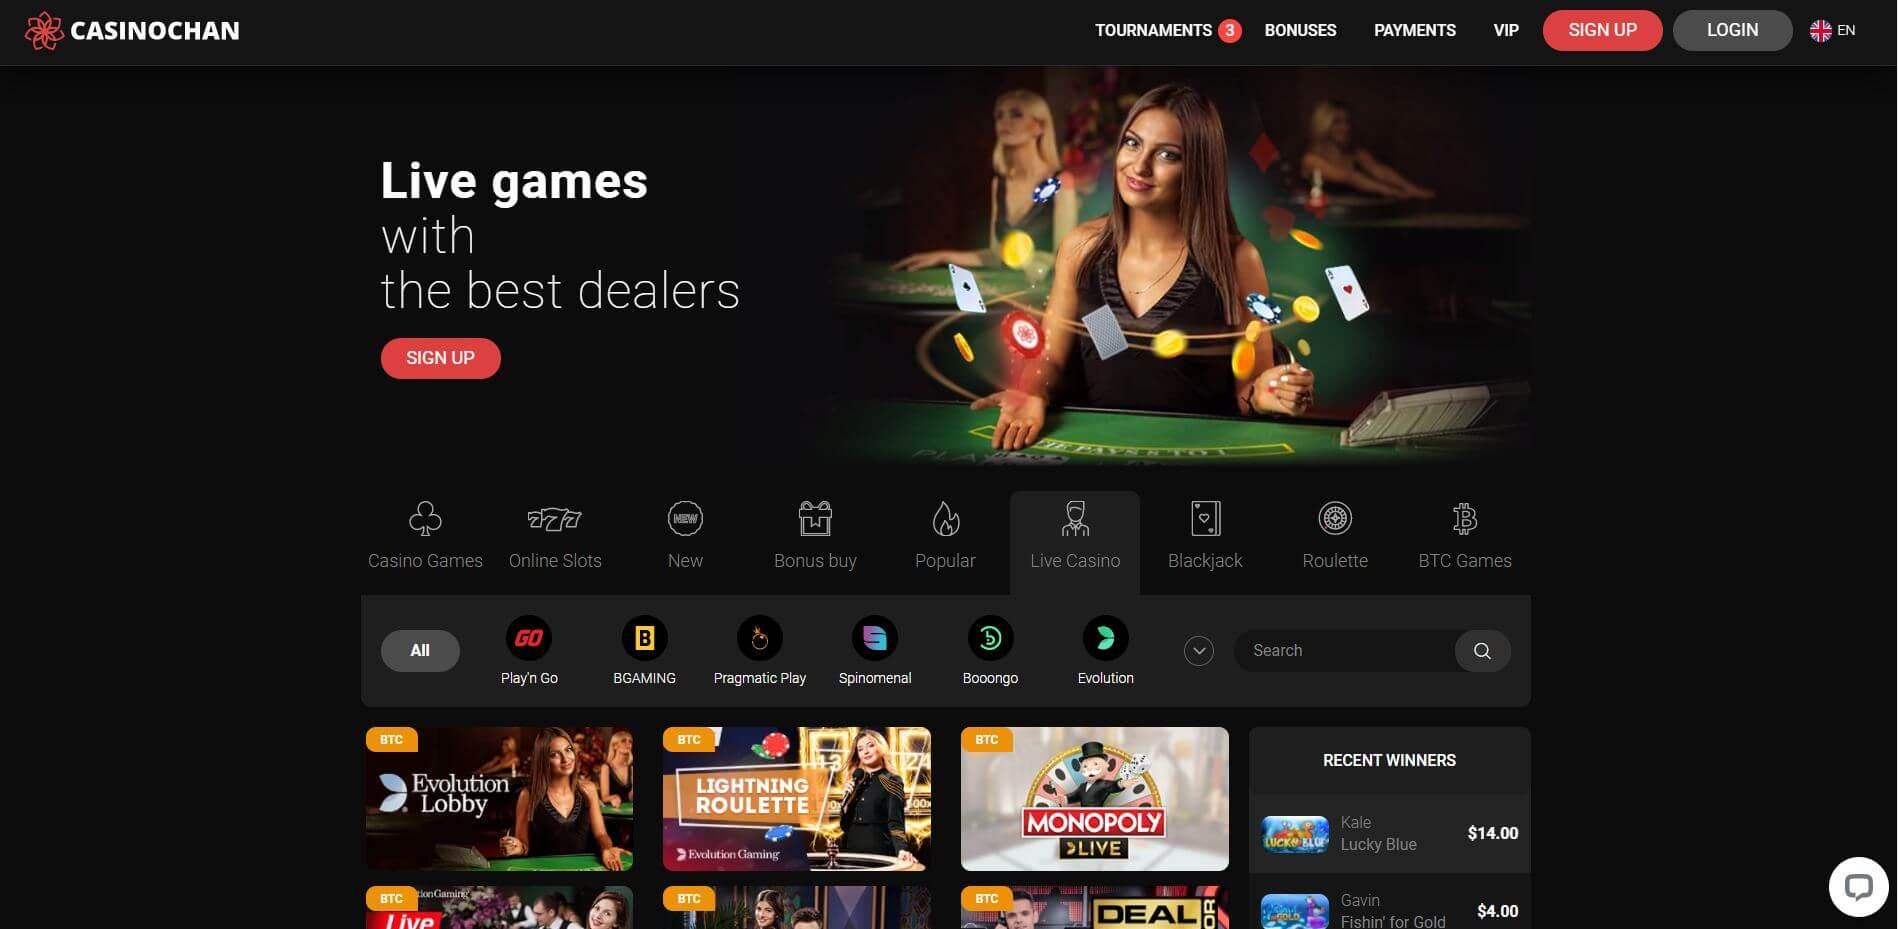 Casino Chan Live Games